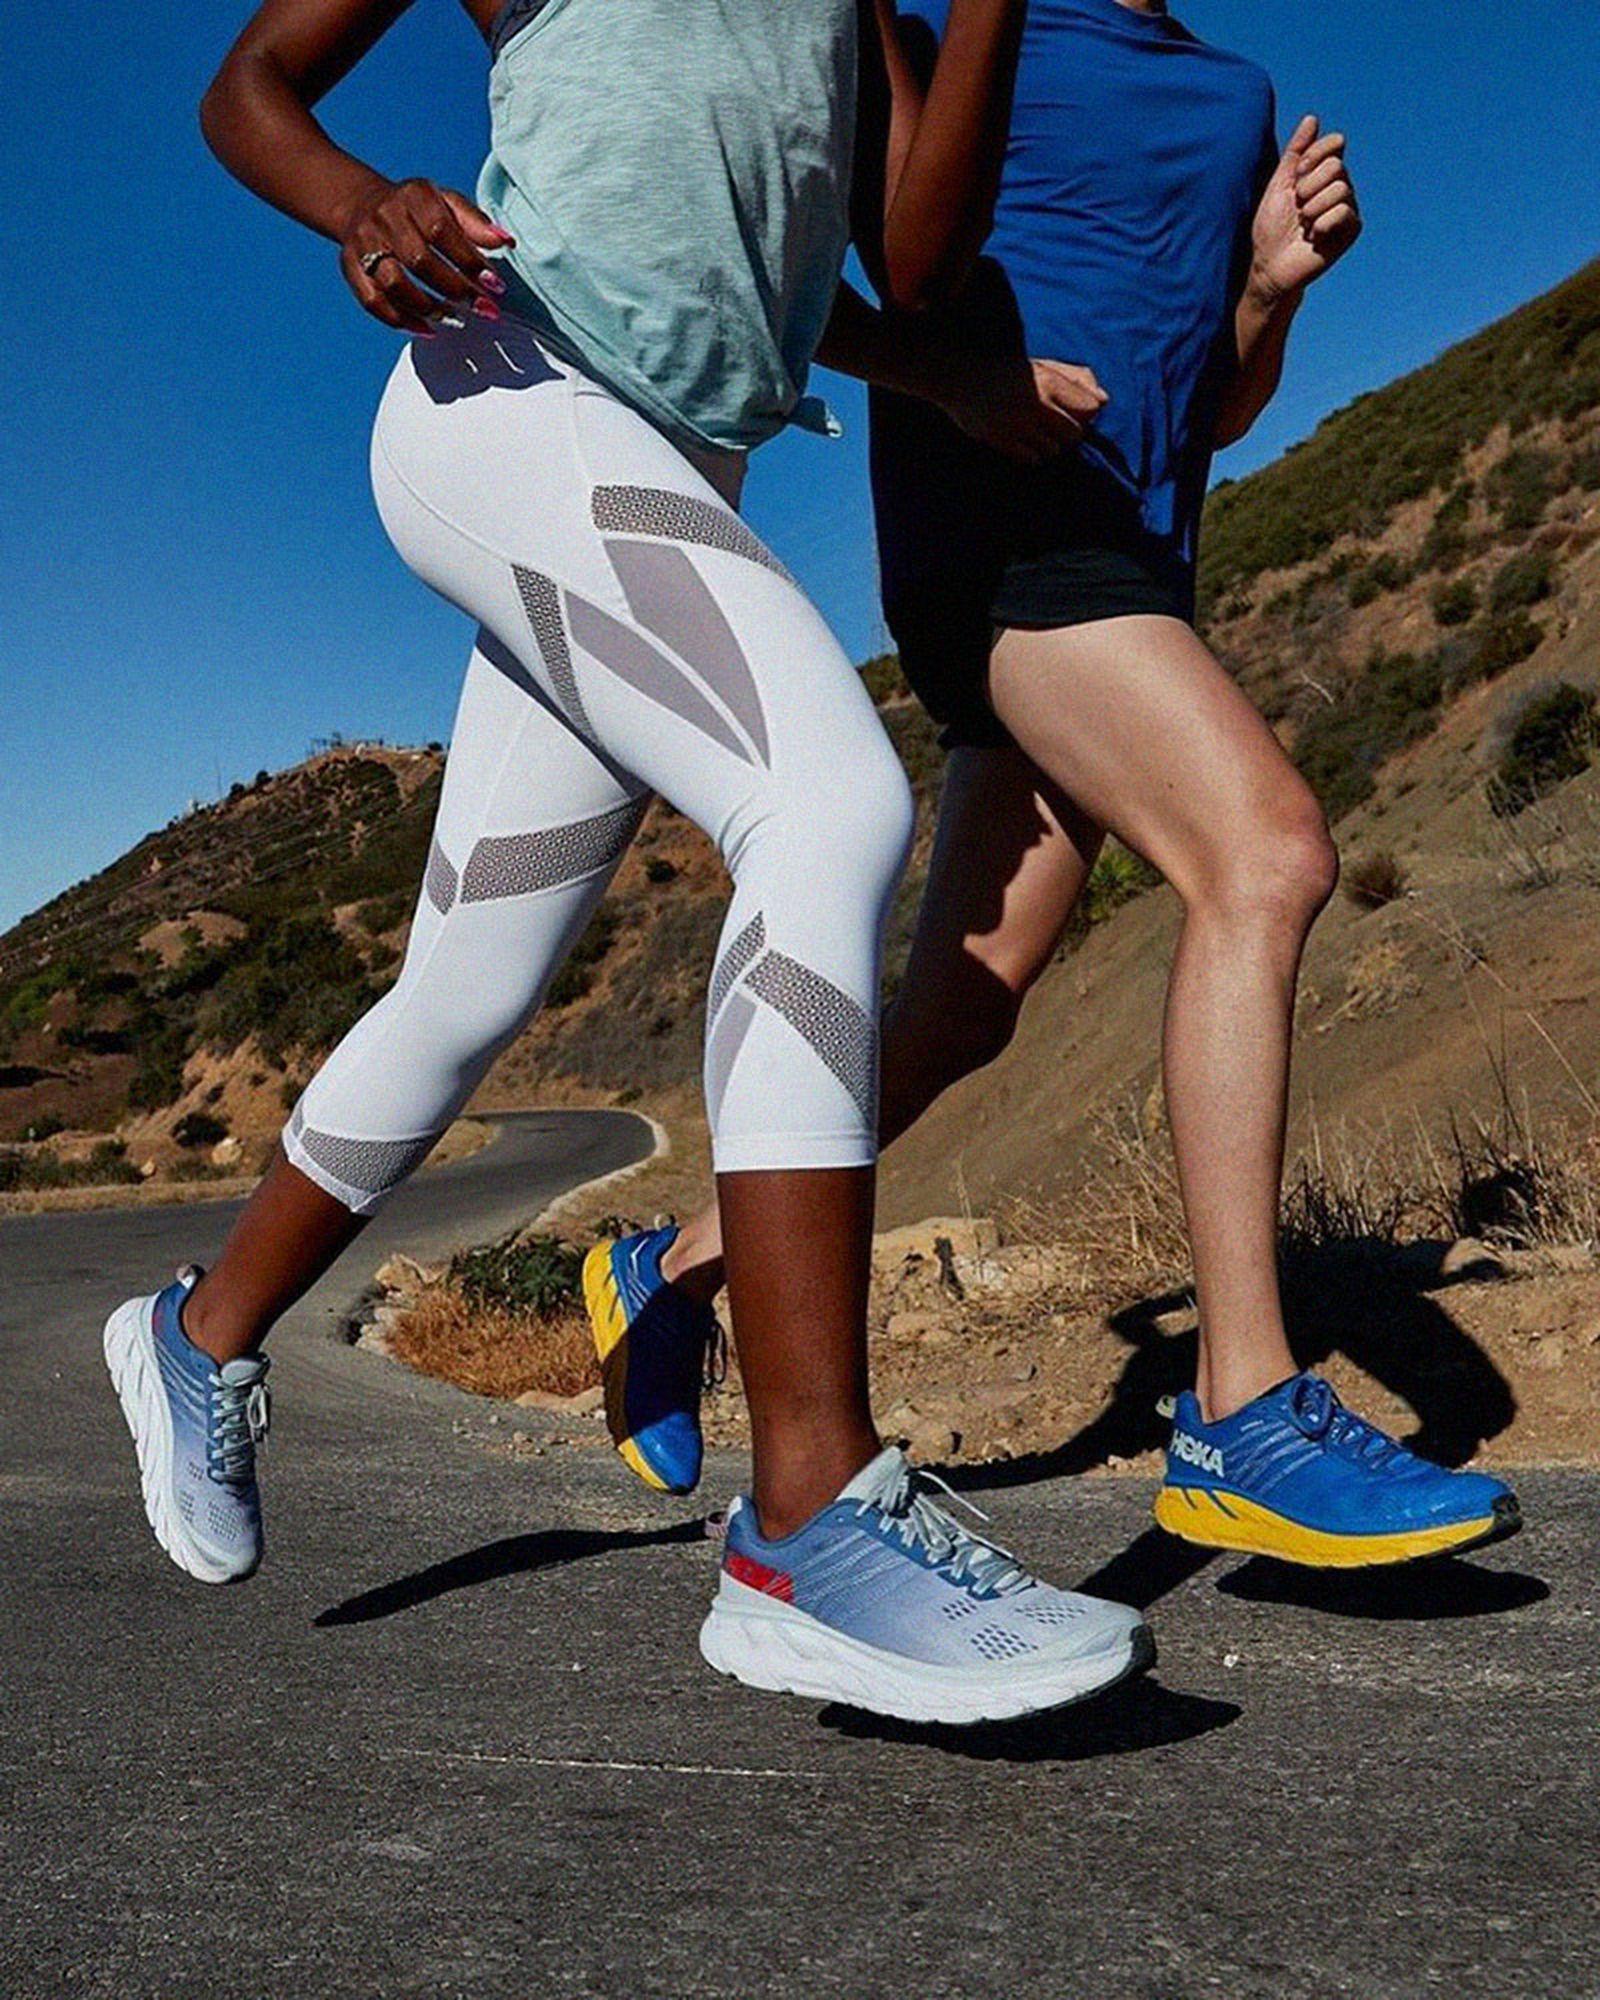 best sportswear brands world right now Adidas HOKA Nike